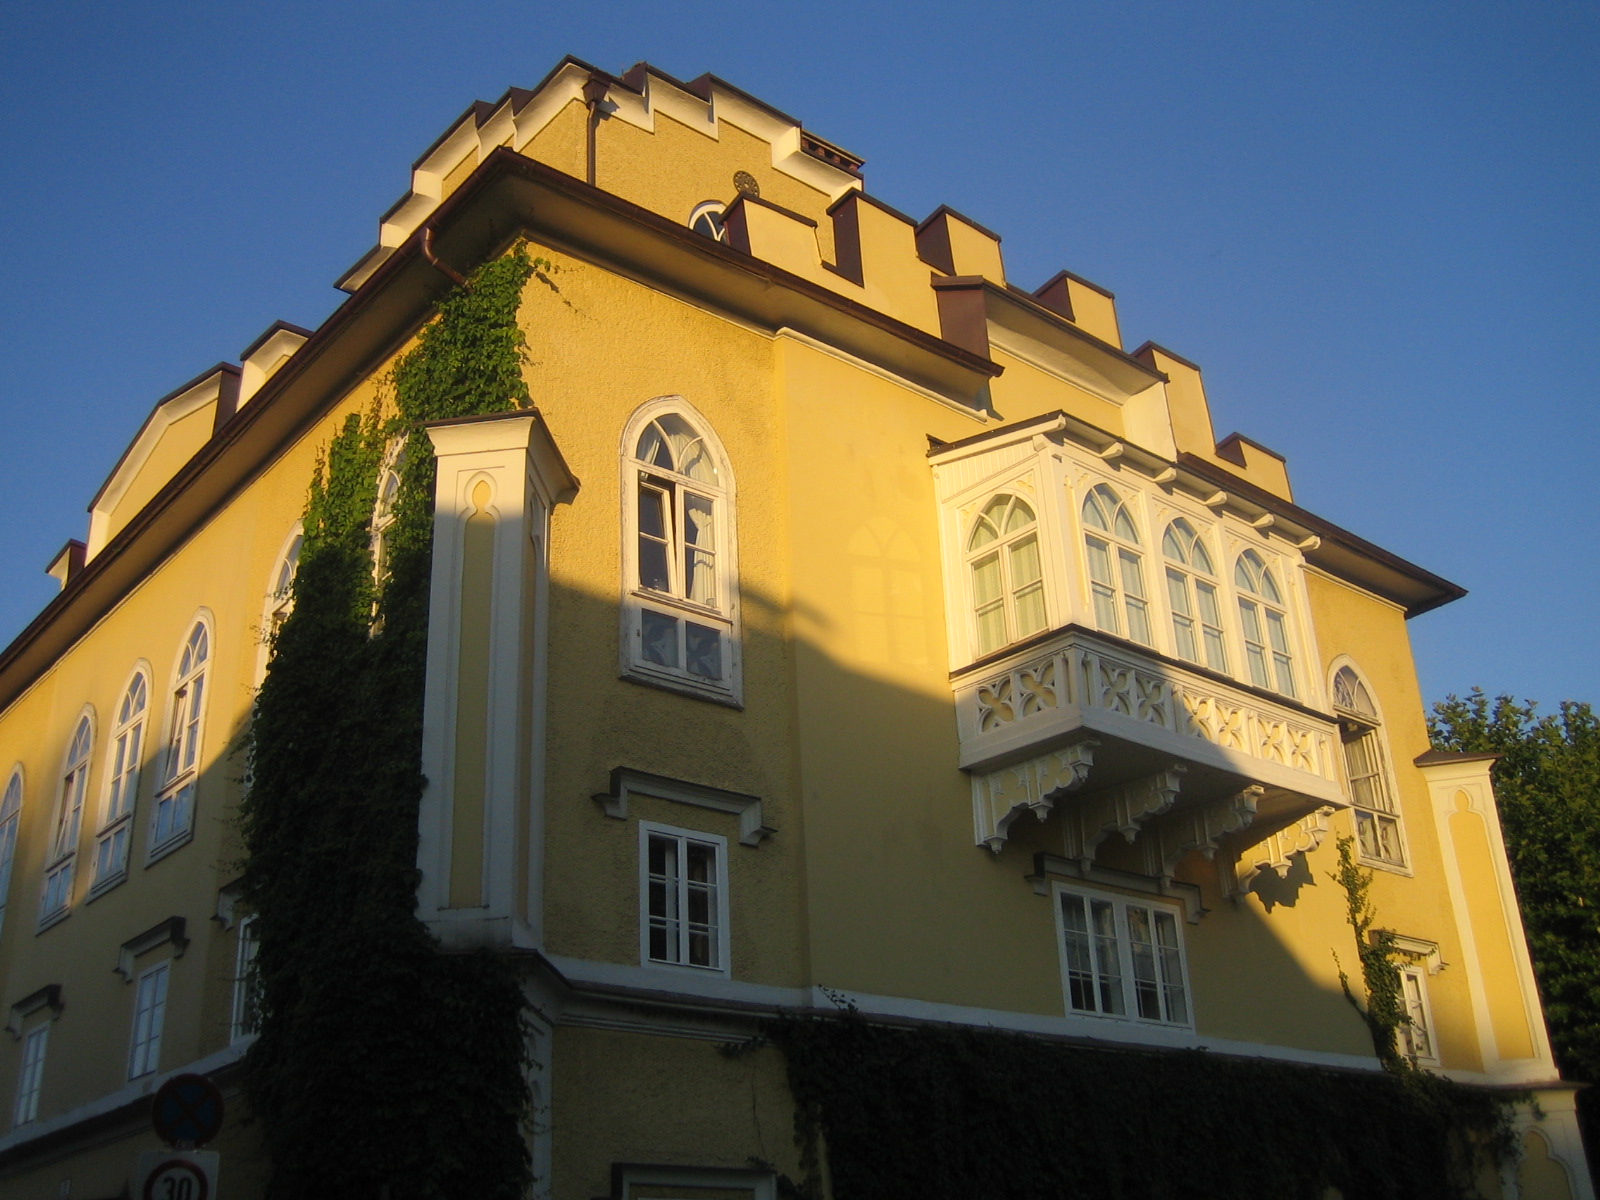 Frauen Frhstcks Treffen - Bad Goisern - RiS-Kommunal